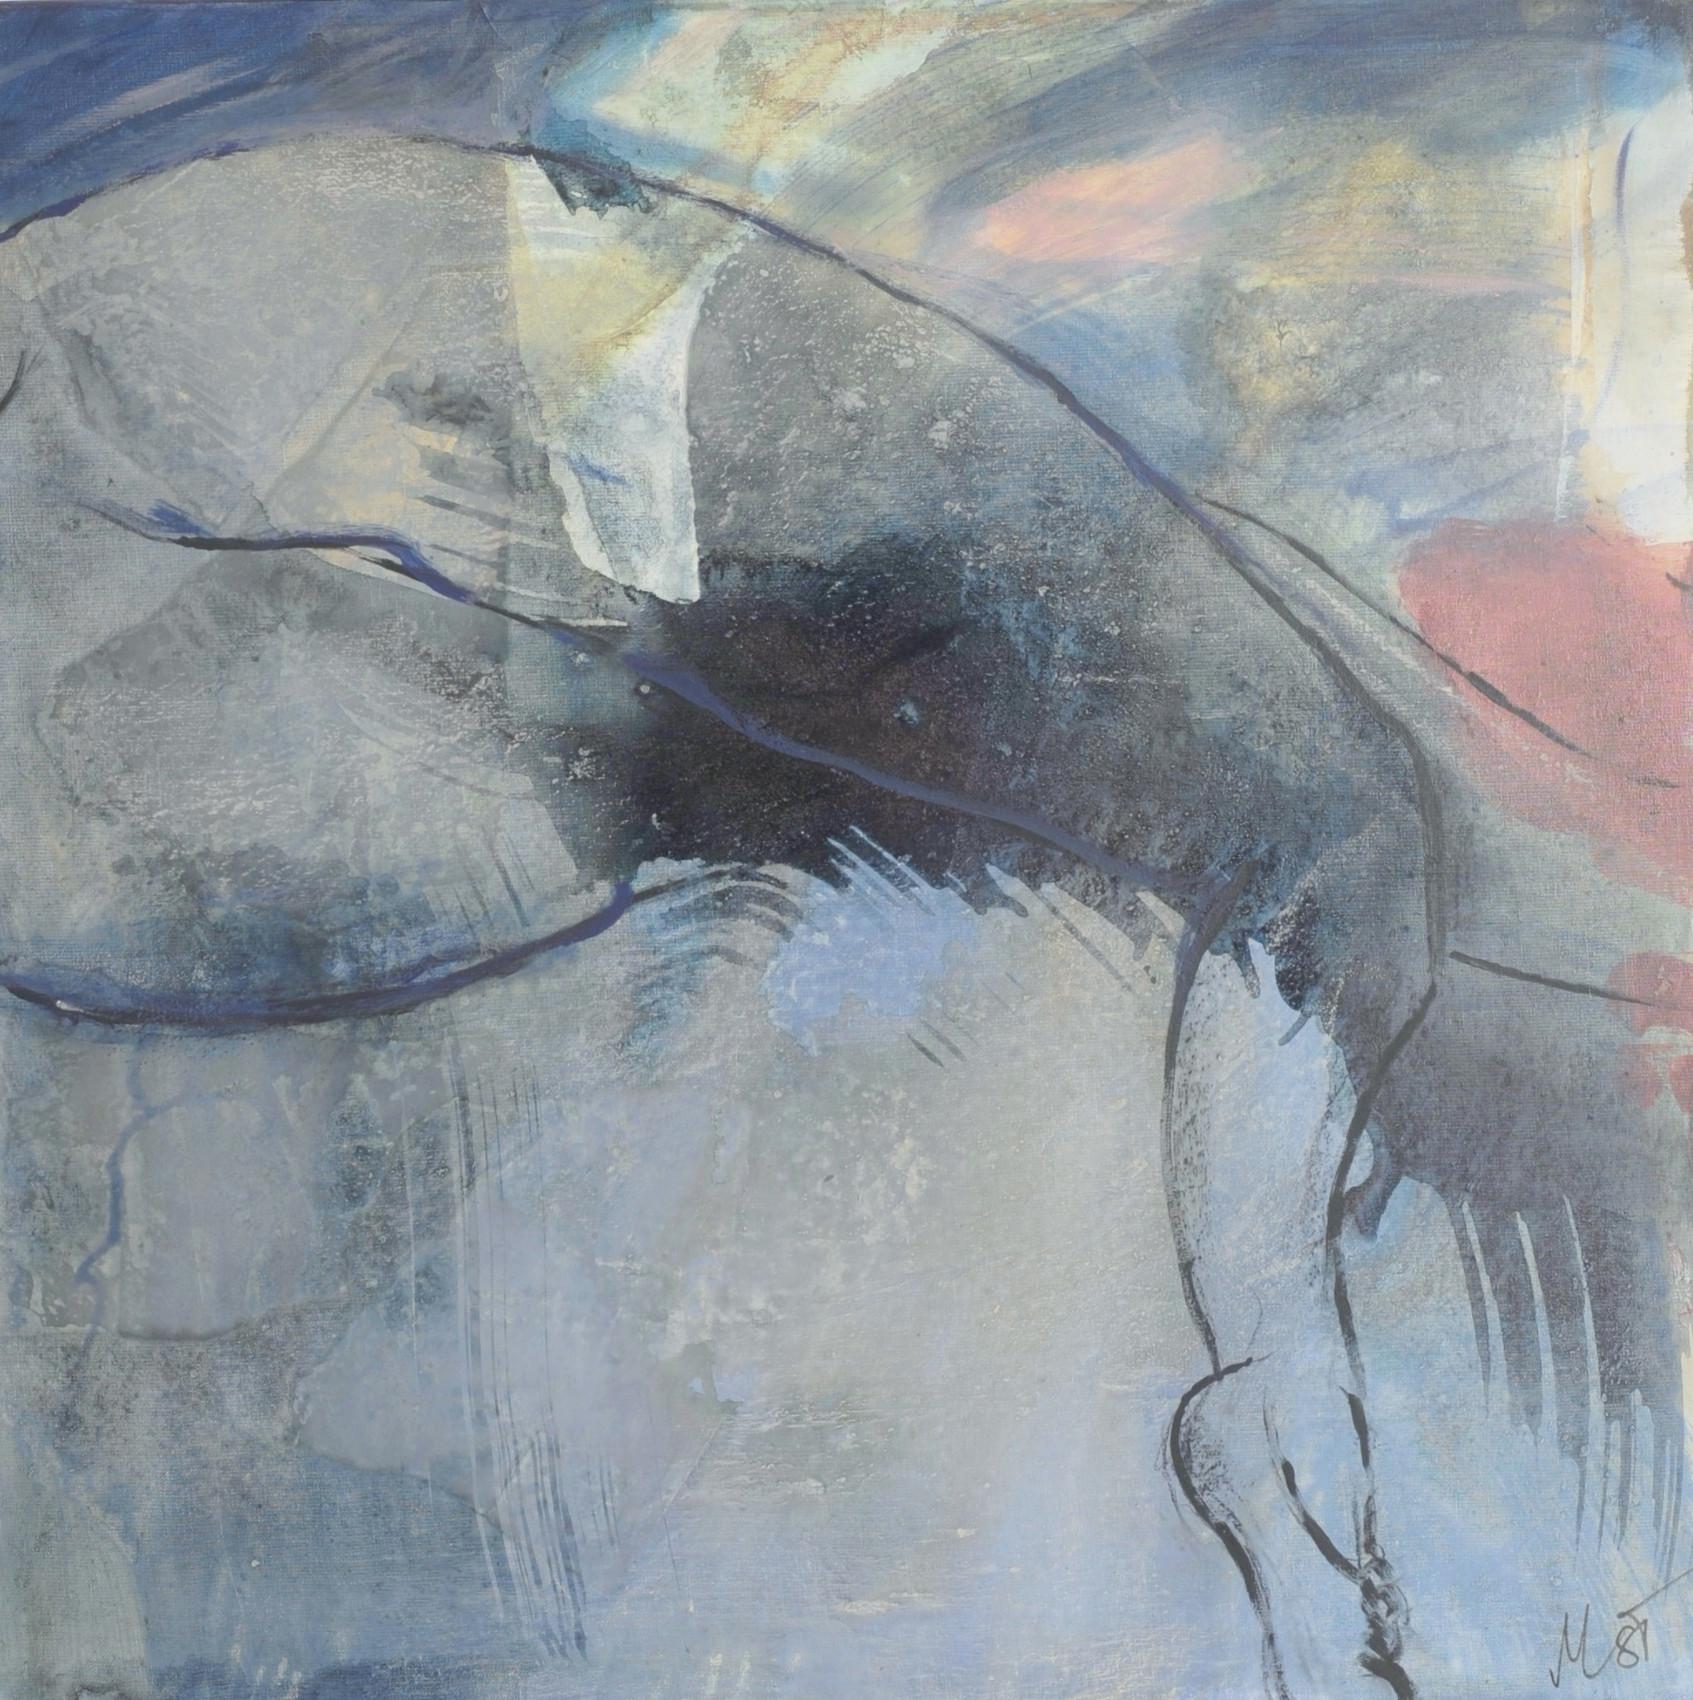 body and soul II, 80x80, 2013, acryl auf leinwand